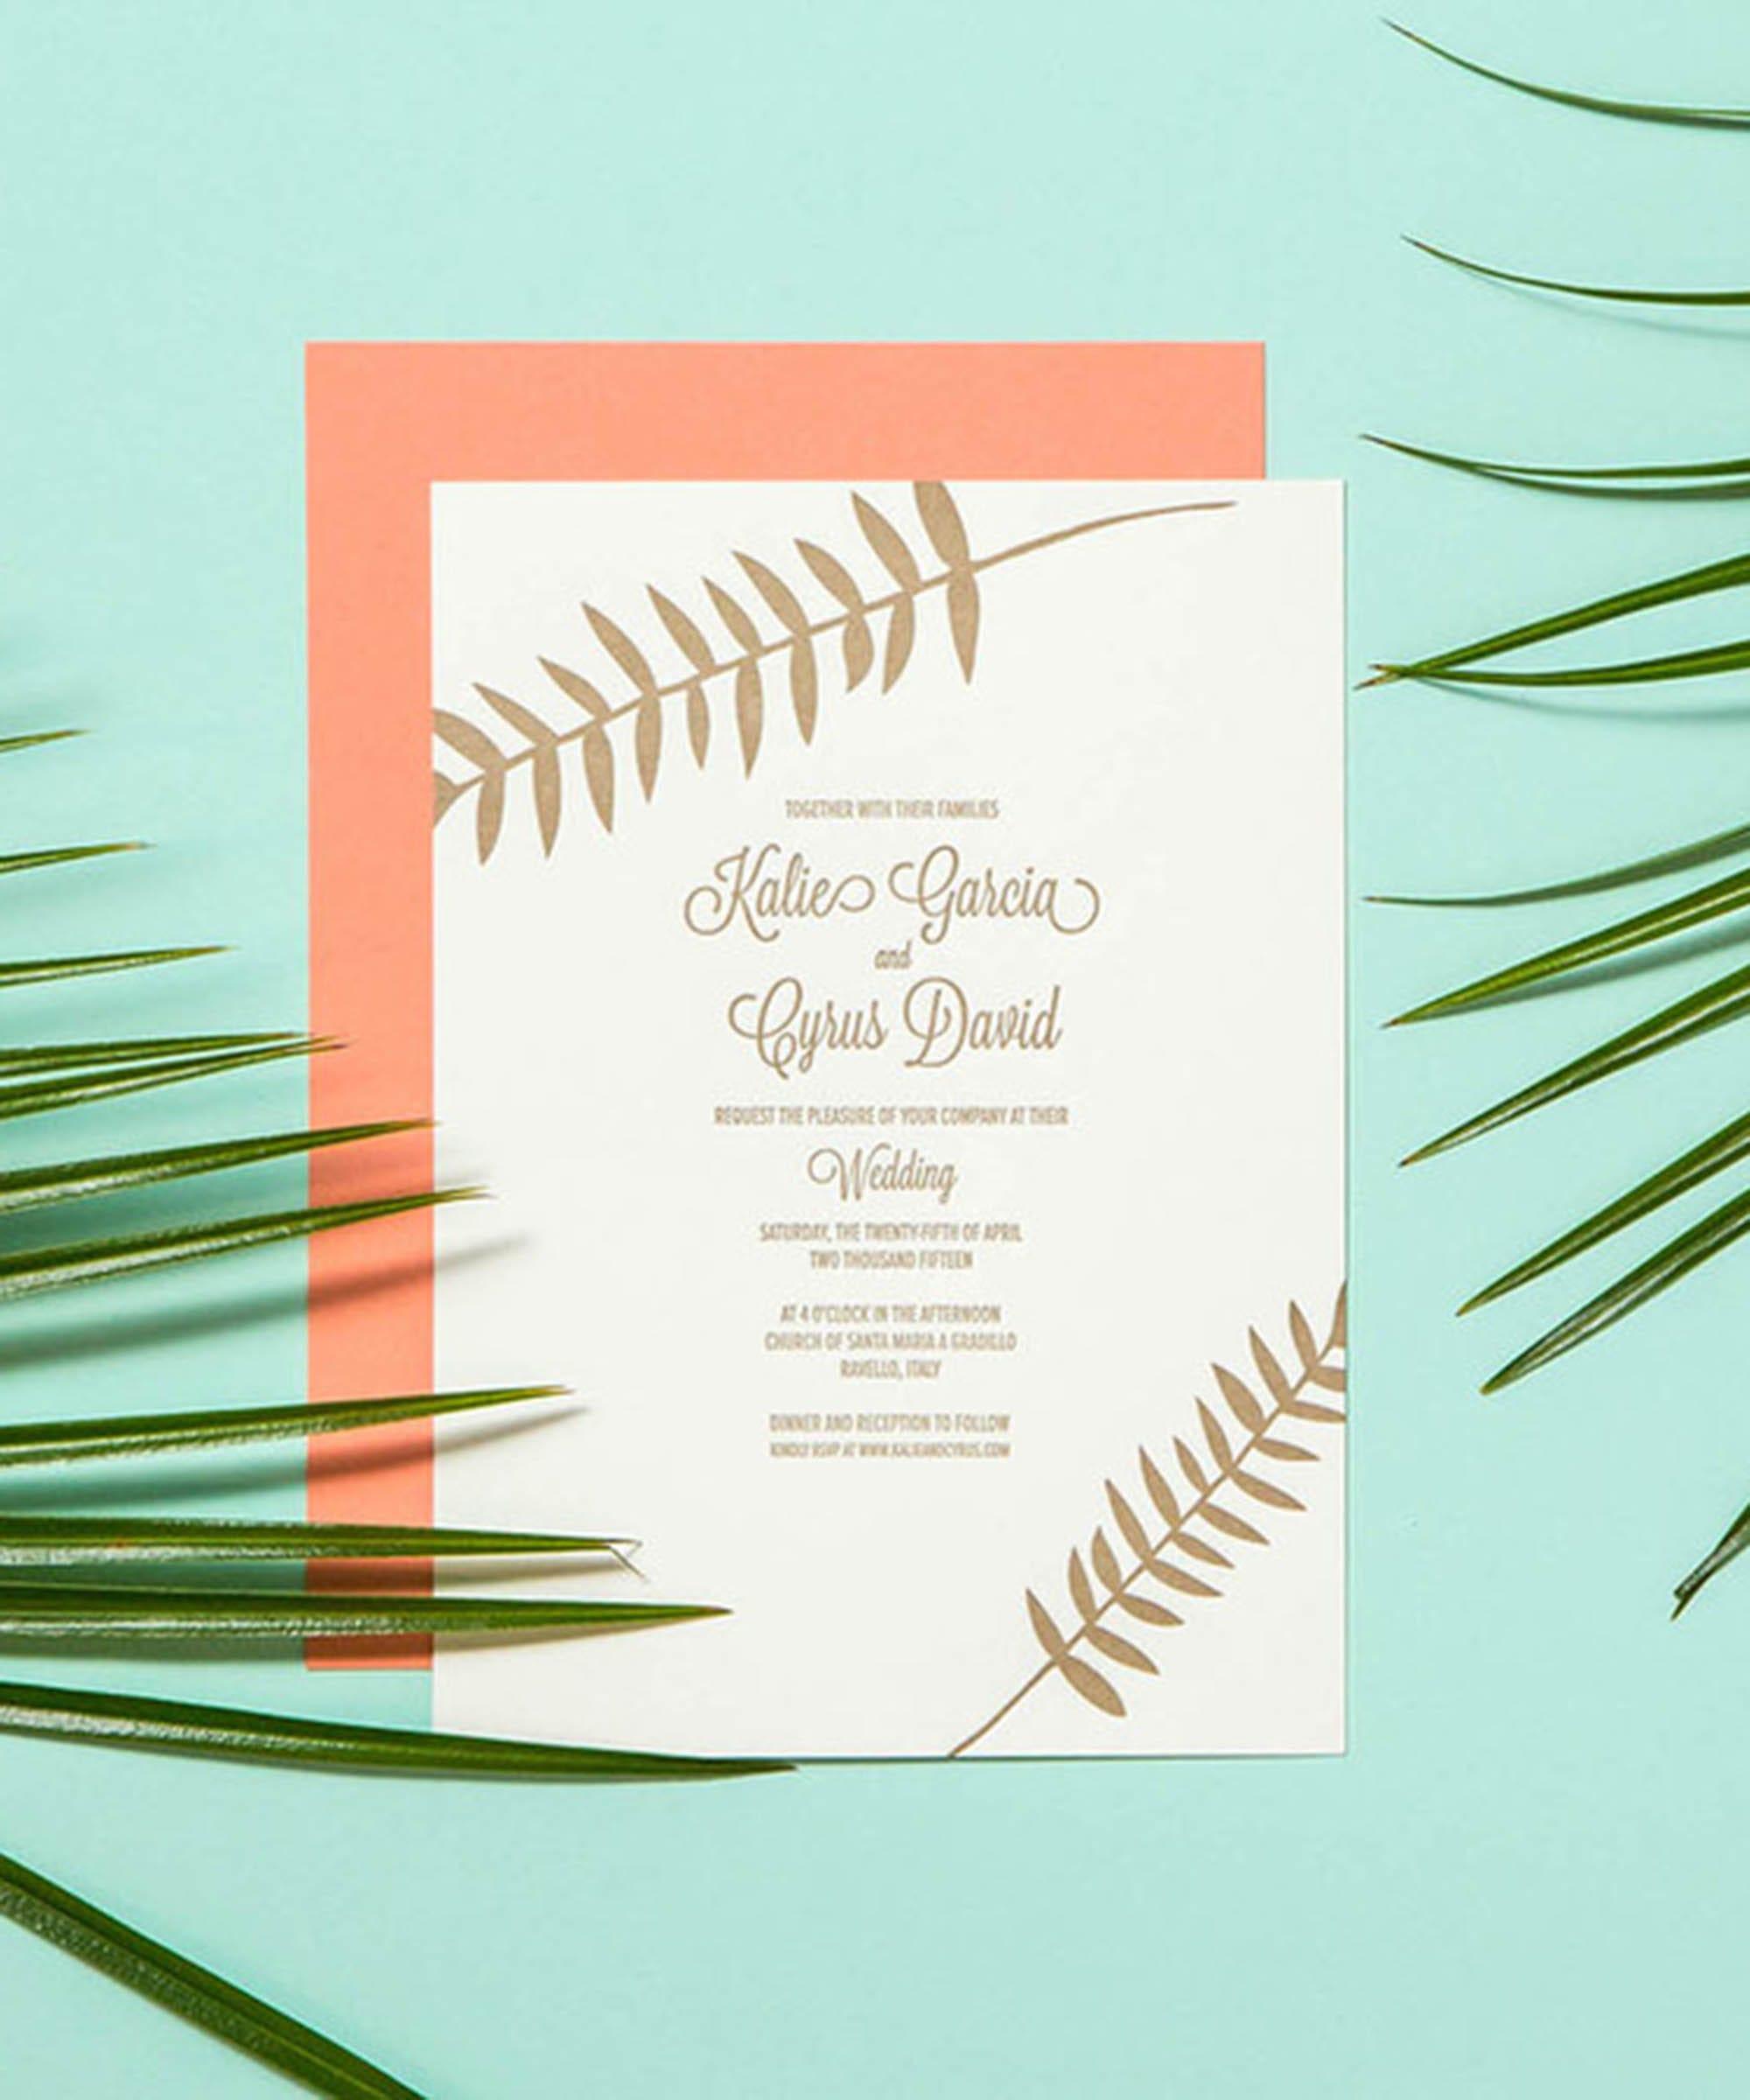 Cheap Online Wedding Invitations: Cheap Wedding Invitations, Cards, Invites, Stationery